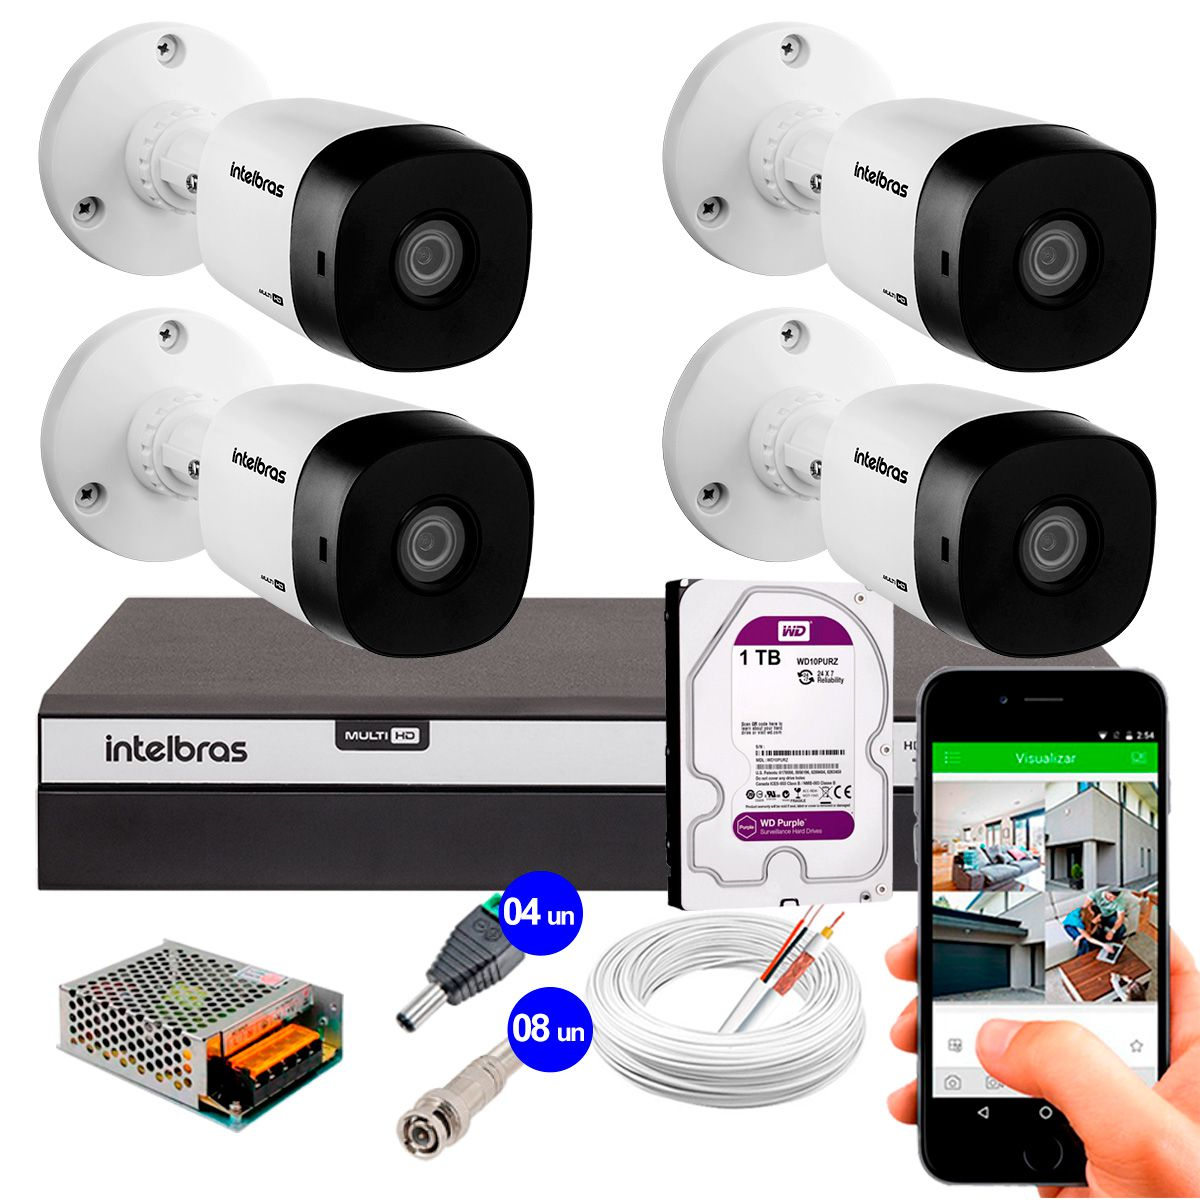 Kit 4 Câmeras de Segurança Full HD 1080p VHD 1220B IR + DVR Intelbras Full HD + HD WD Purple 1TB + Acessórios  - Tudo Forte